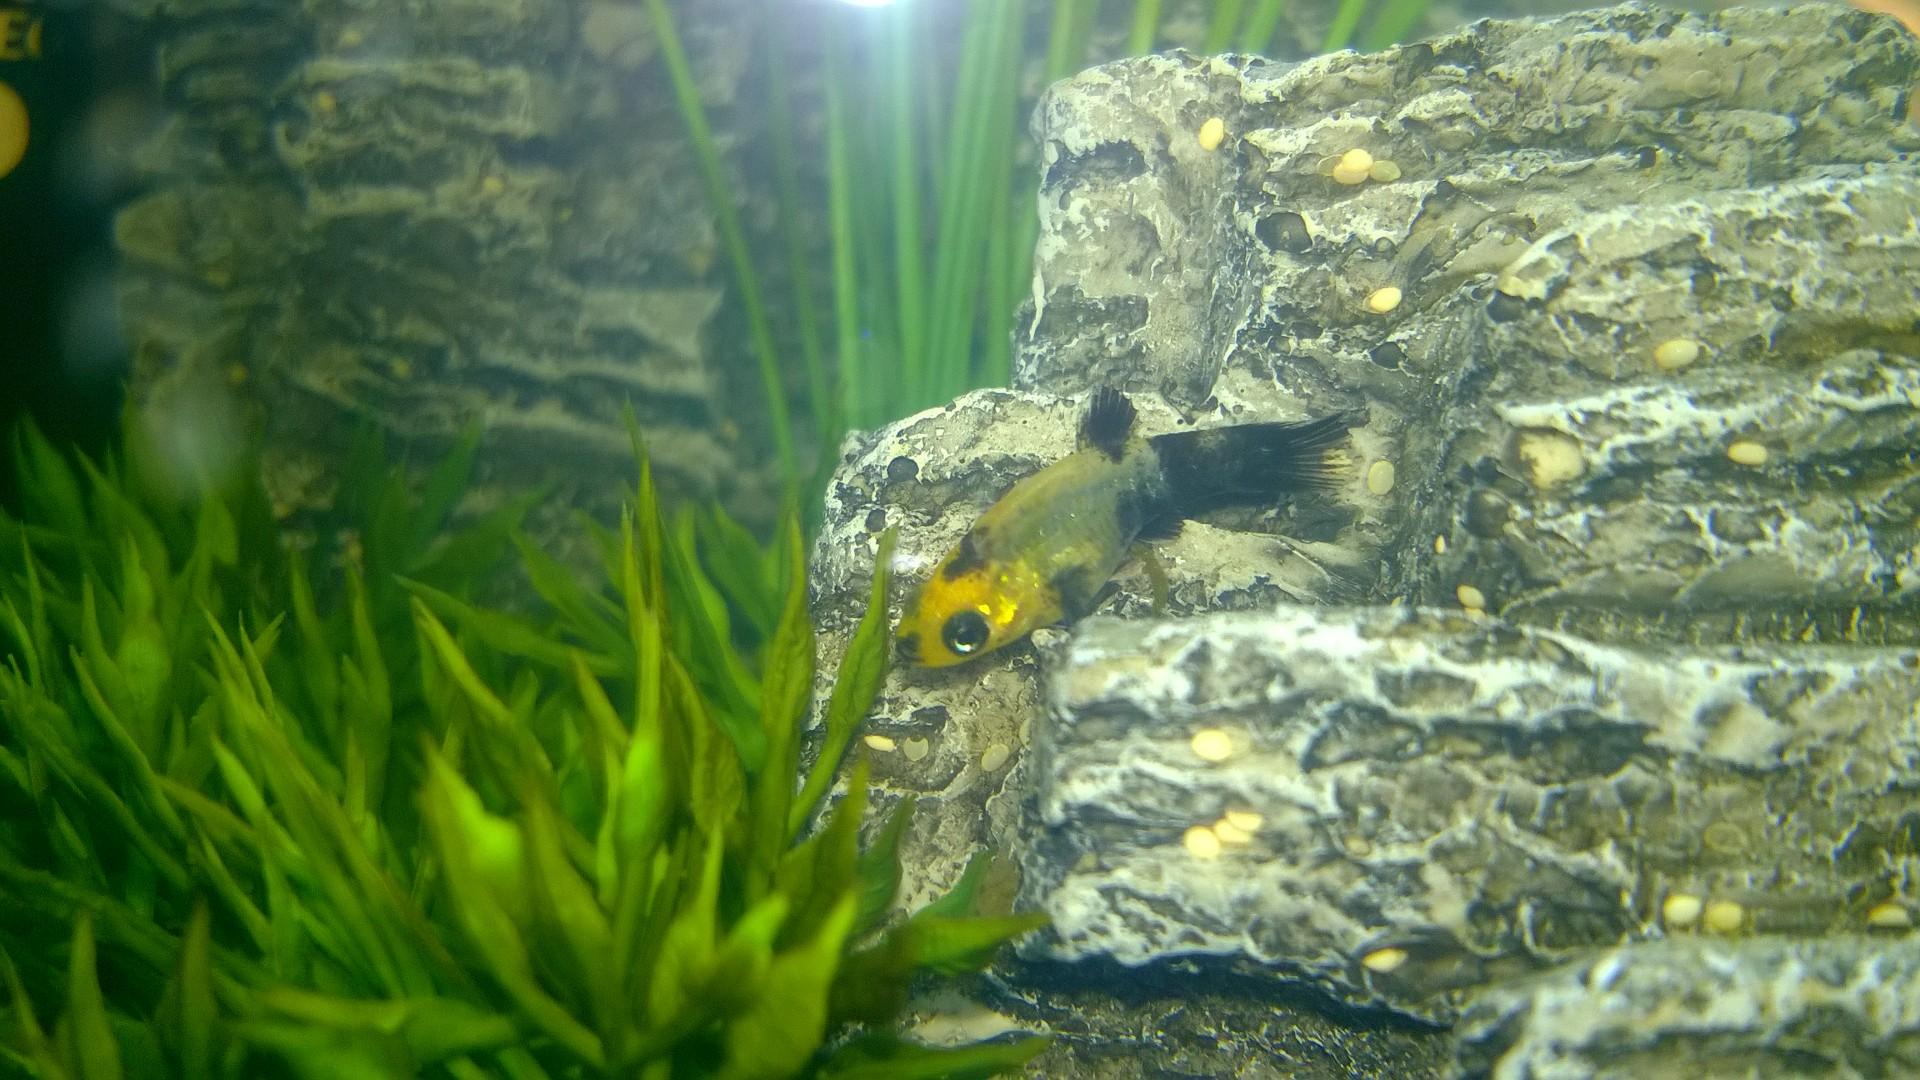 The Fish Baby